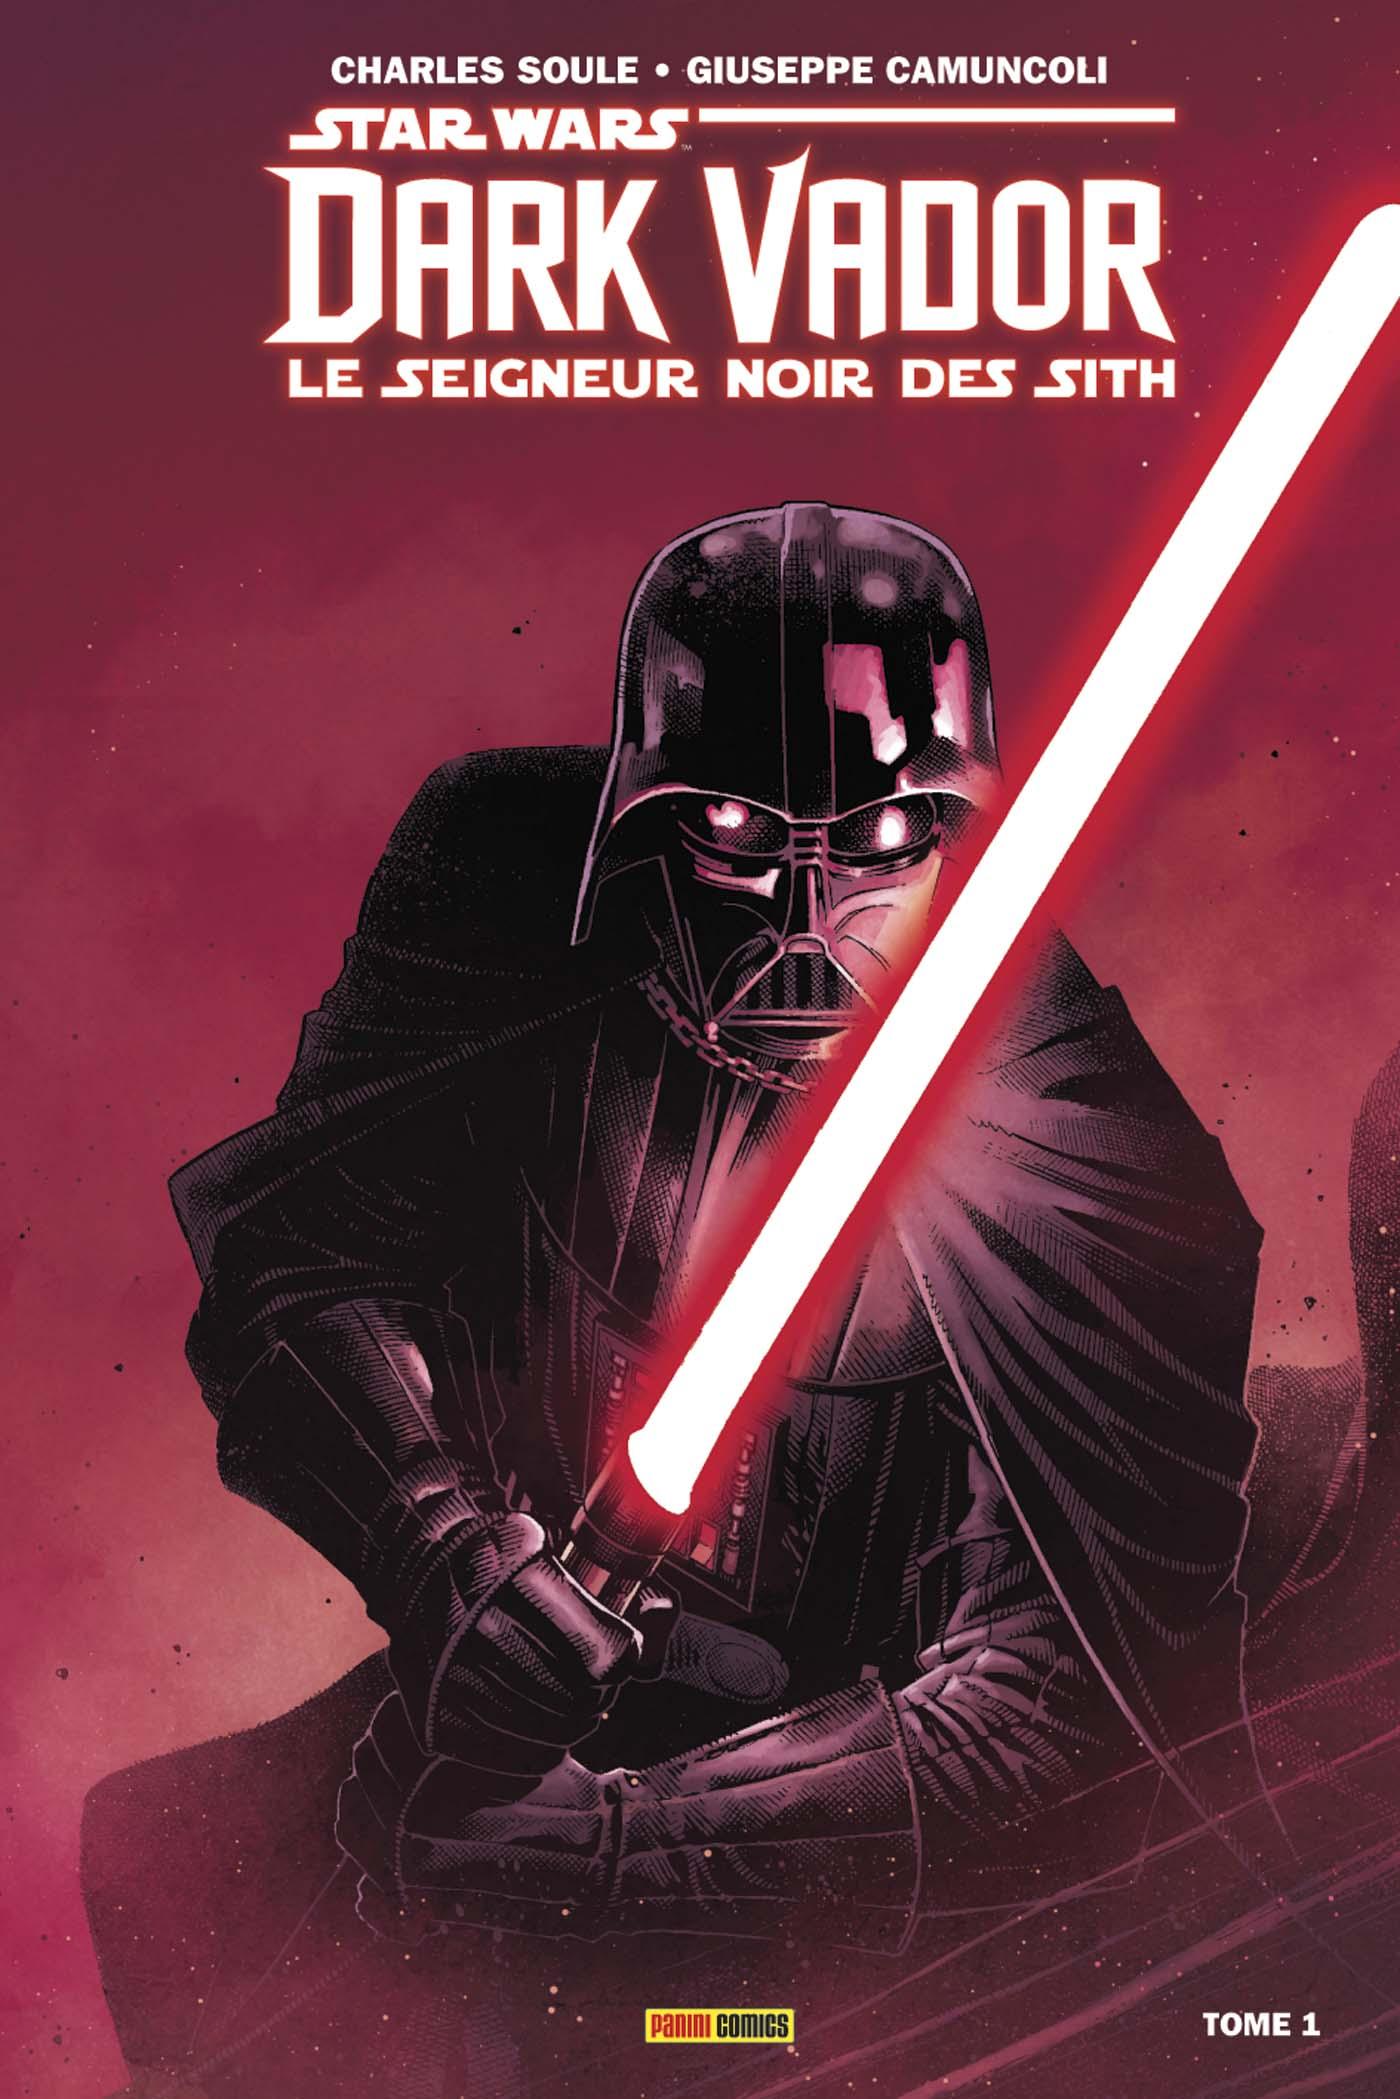 dark-vador-le-seigneur-noir-des-siths-tome-1-vf